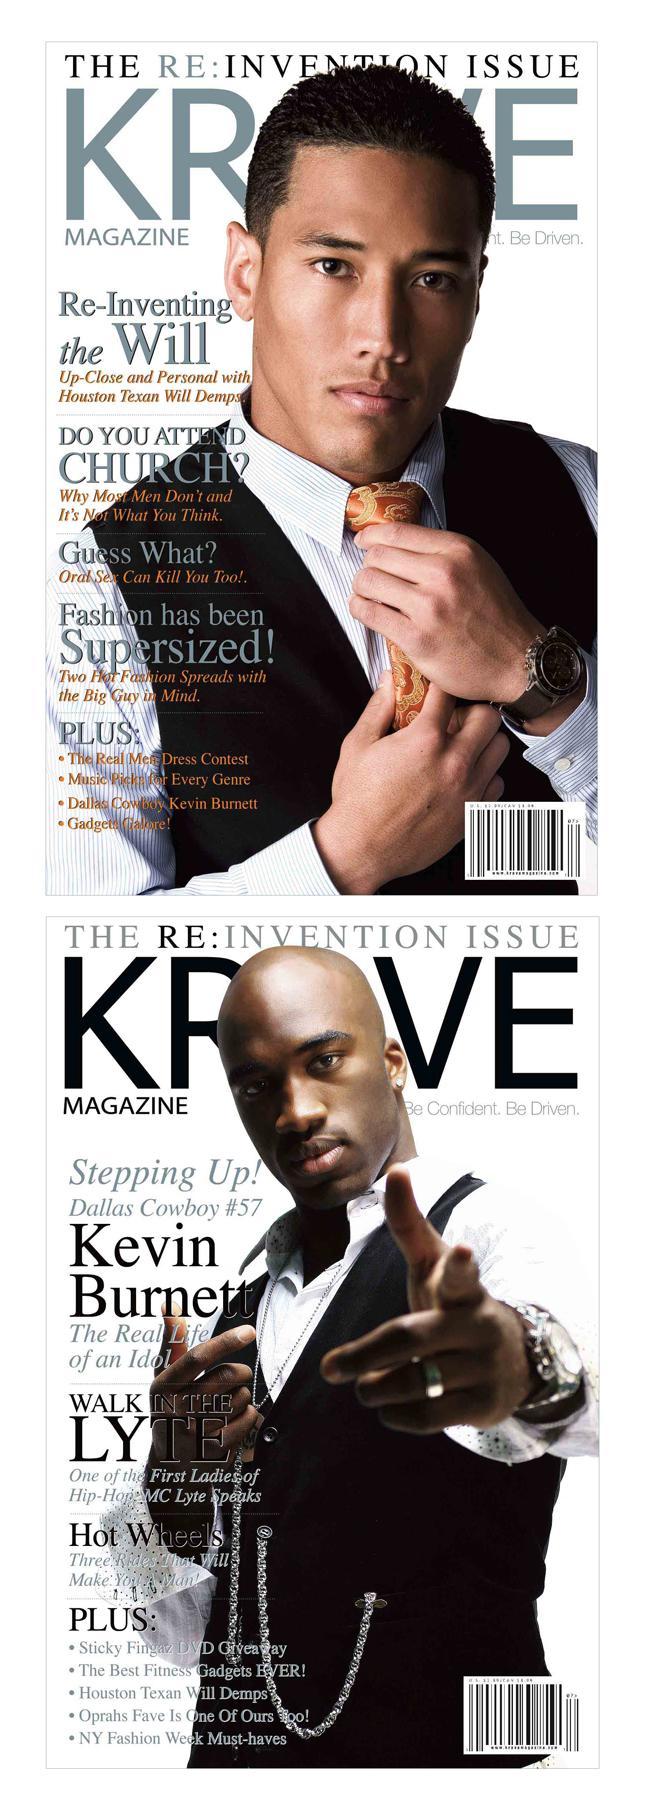 Dallas & Houston, Texas Feb 21, 2008 Krave Magazine  Issue #12 Dbl. Cover w/Will Demps & Kevin Burnett